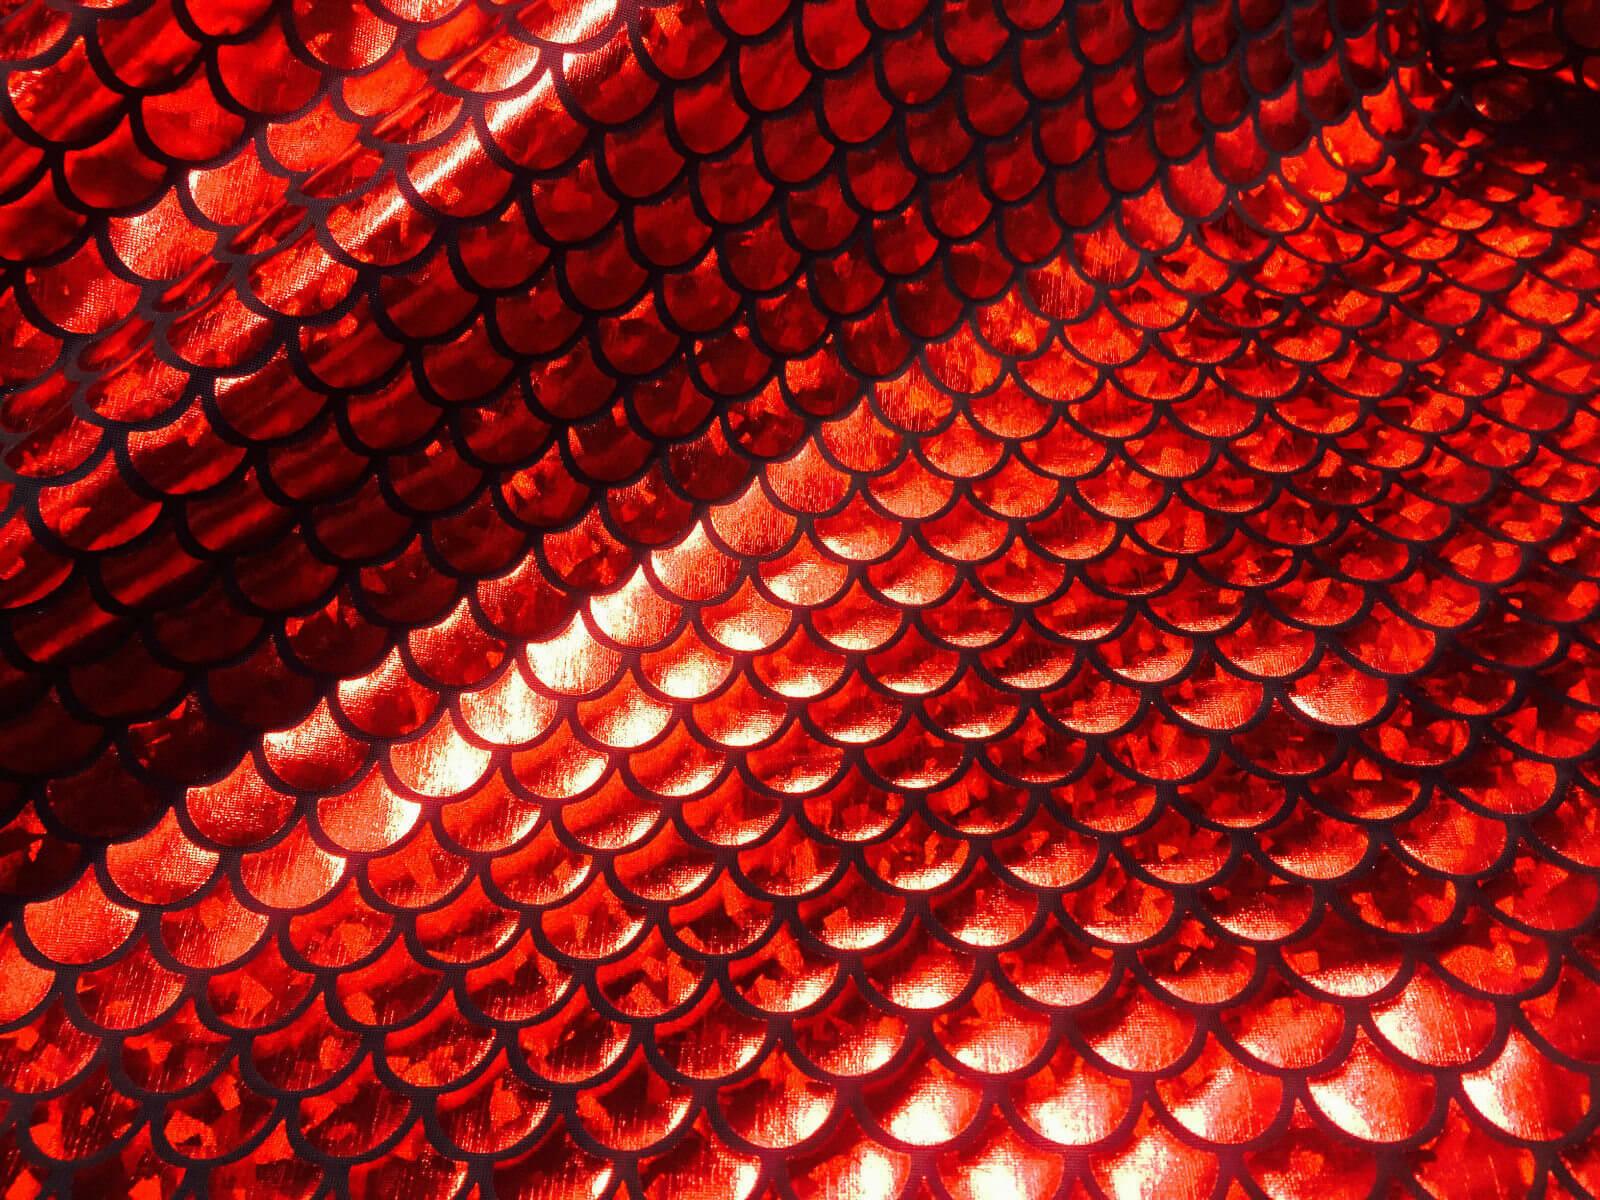 mermaid-scale-fabric-fish-tail-material-2-w-stretch-spandex-57-145cm-wide-red-5b6b667c1.jpg